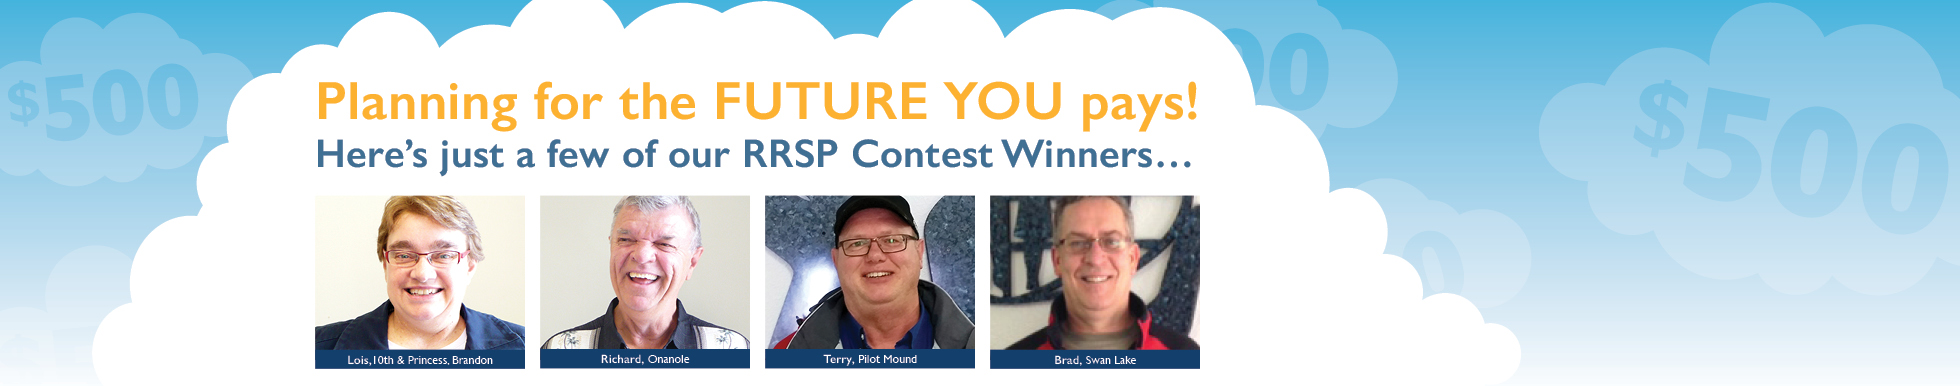 5770 WCU_RRSP_Winners_Web_Banner_3